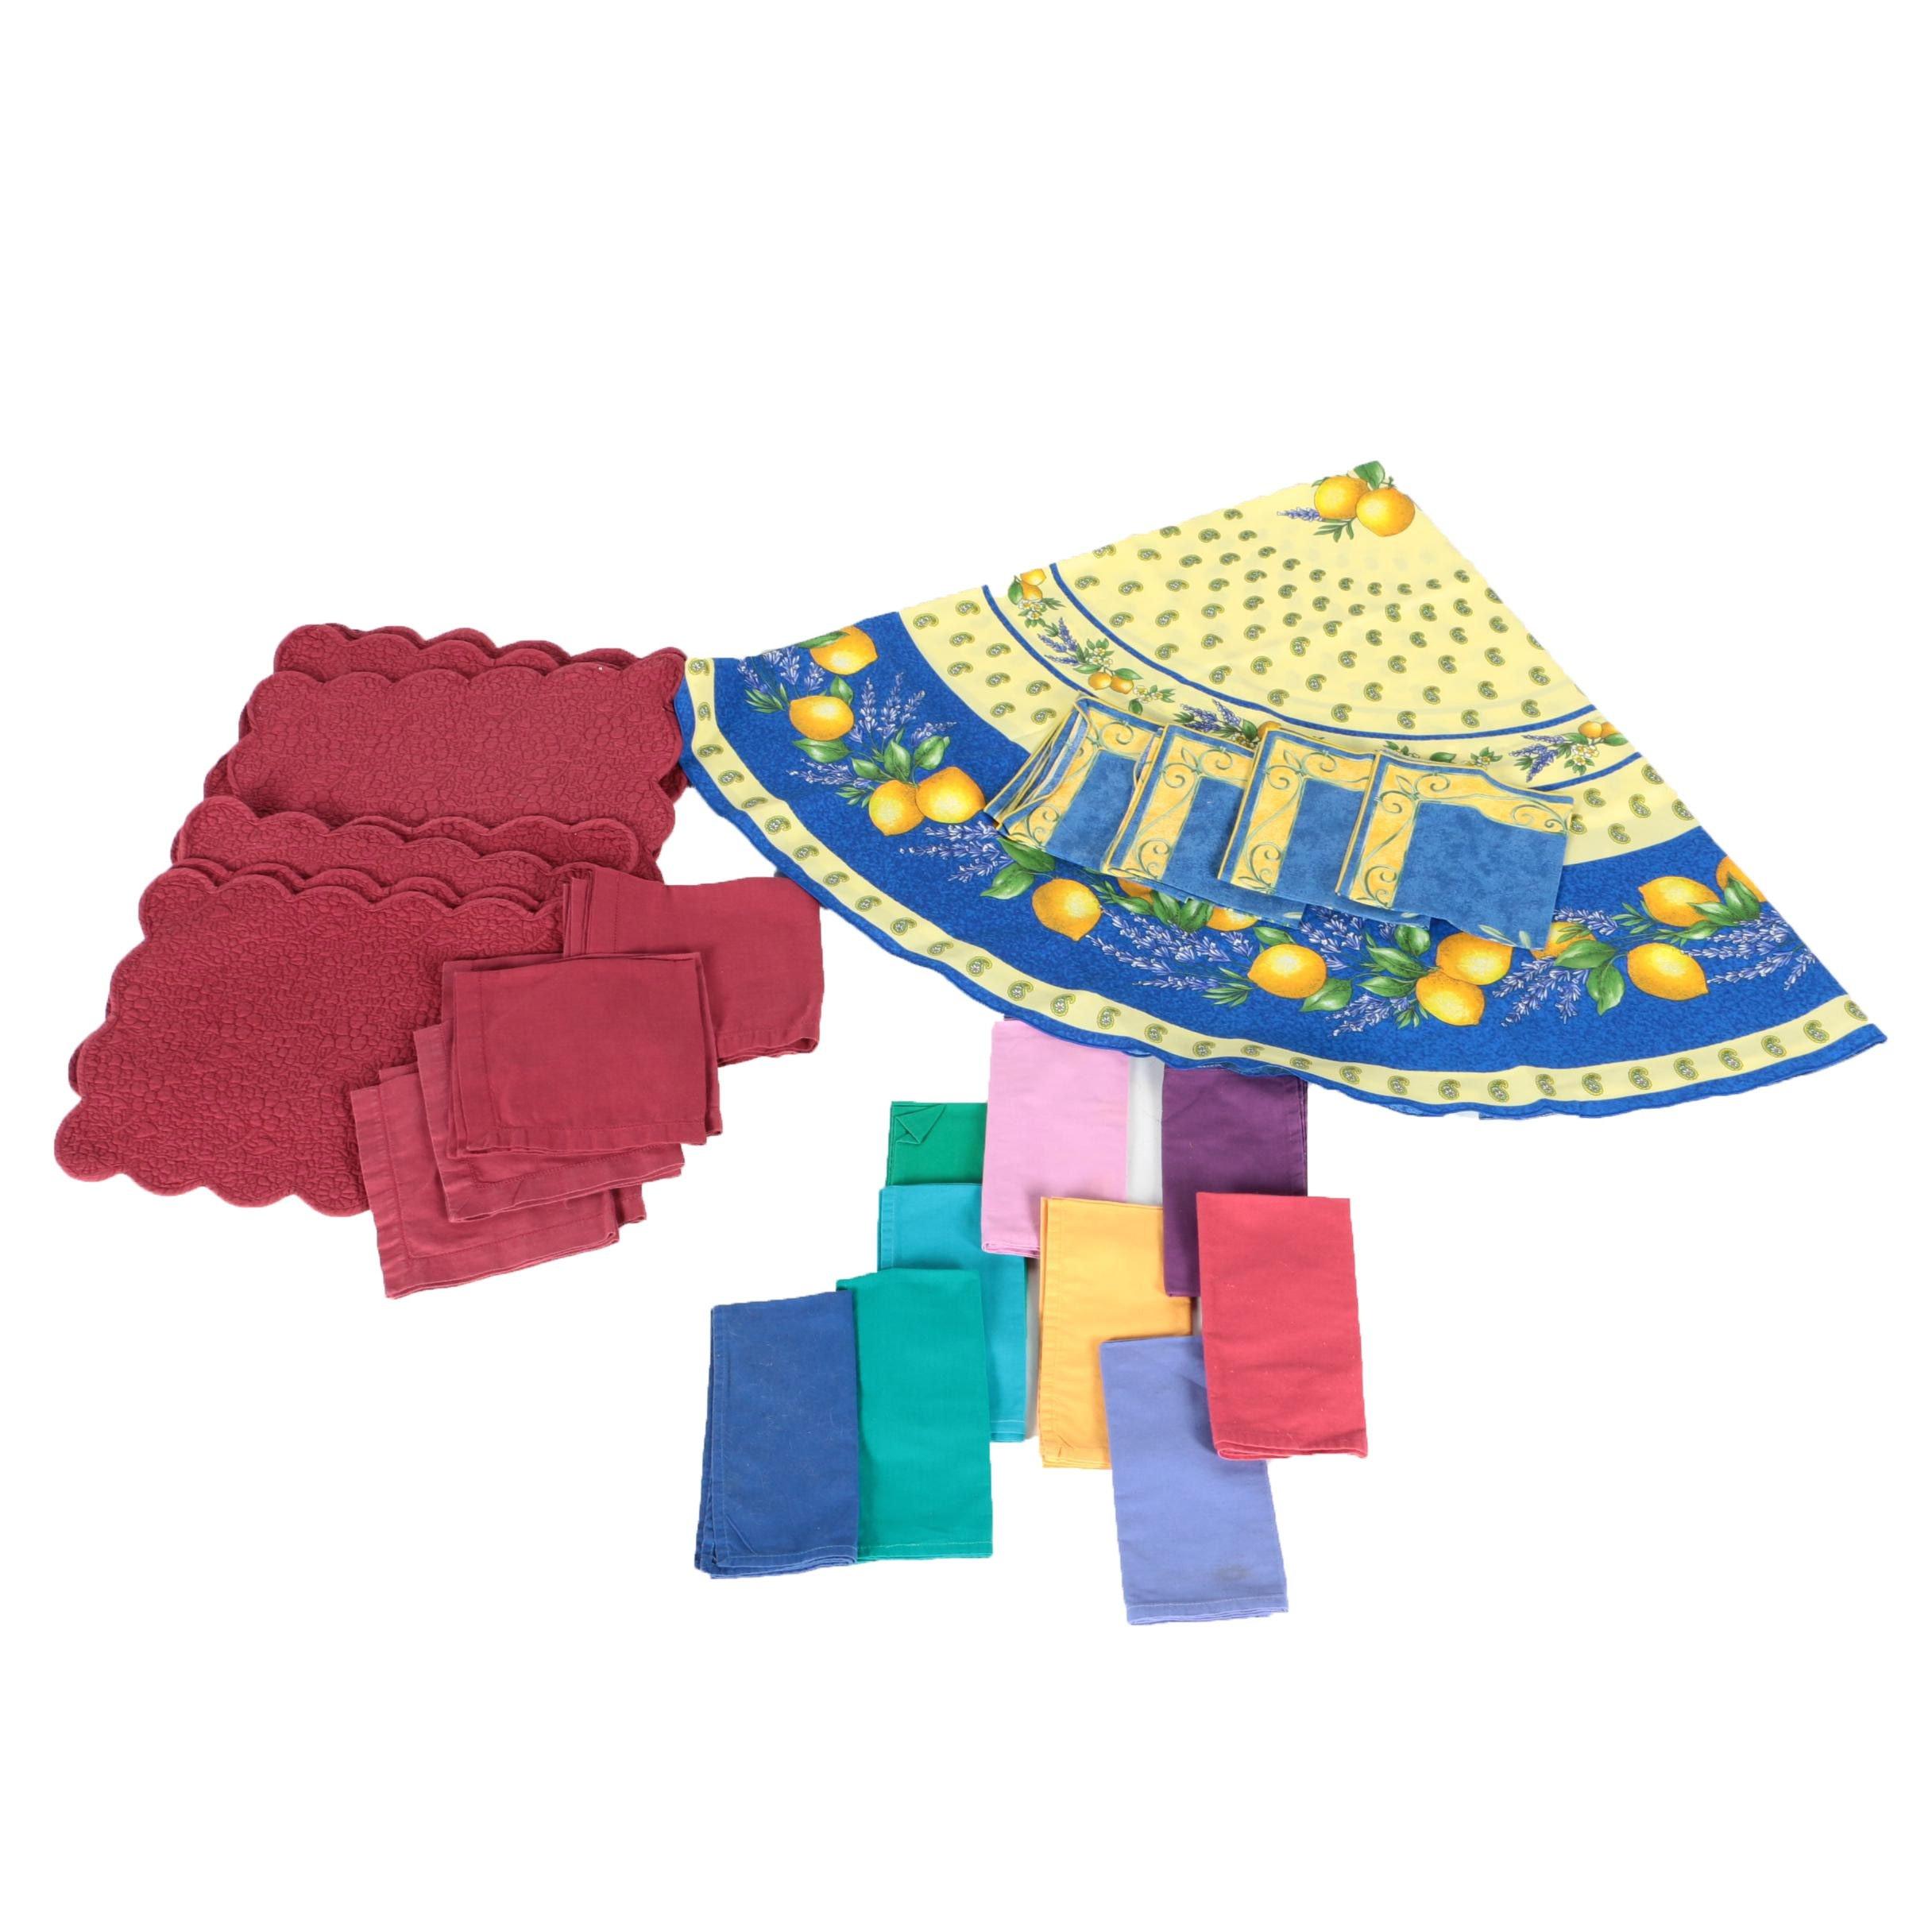 Colorful Cotton Napkins, Floral Placemats and Lemon Patterned Table Linens